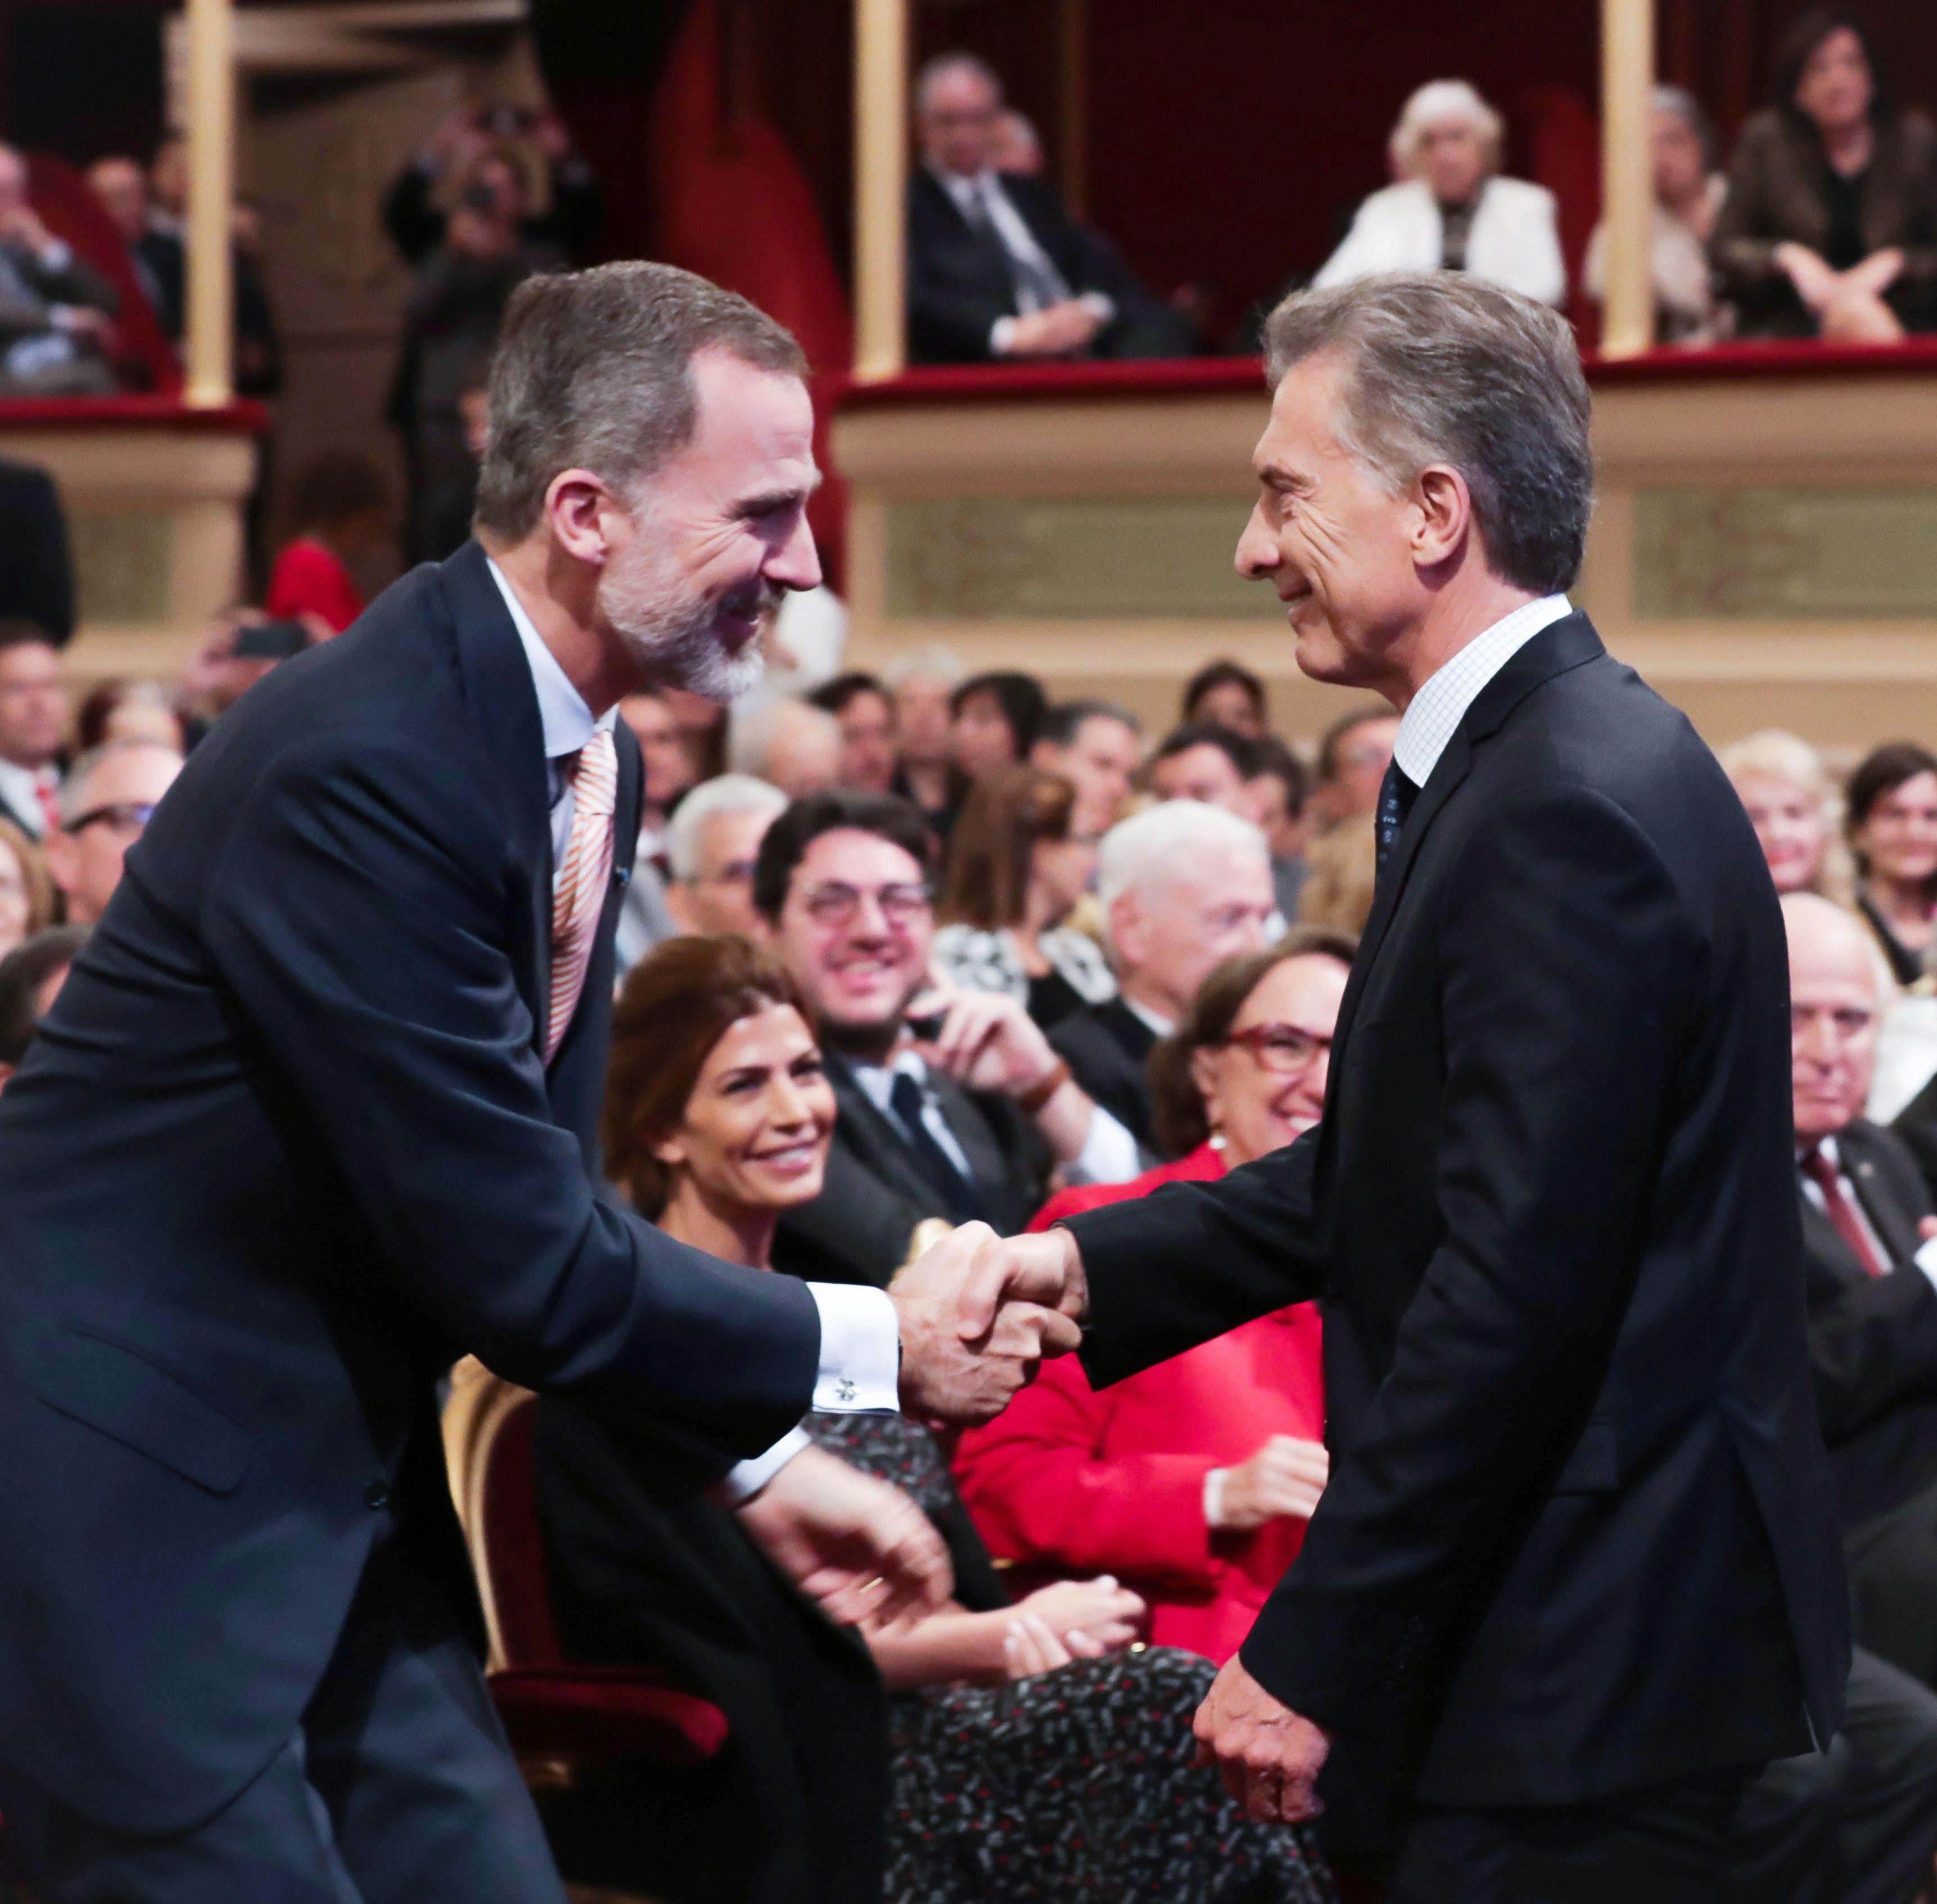 Felipe VI y Mauricio Macri